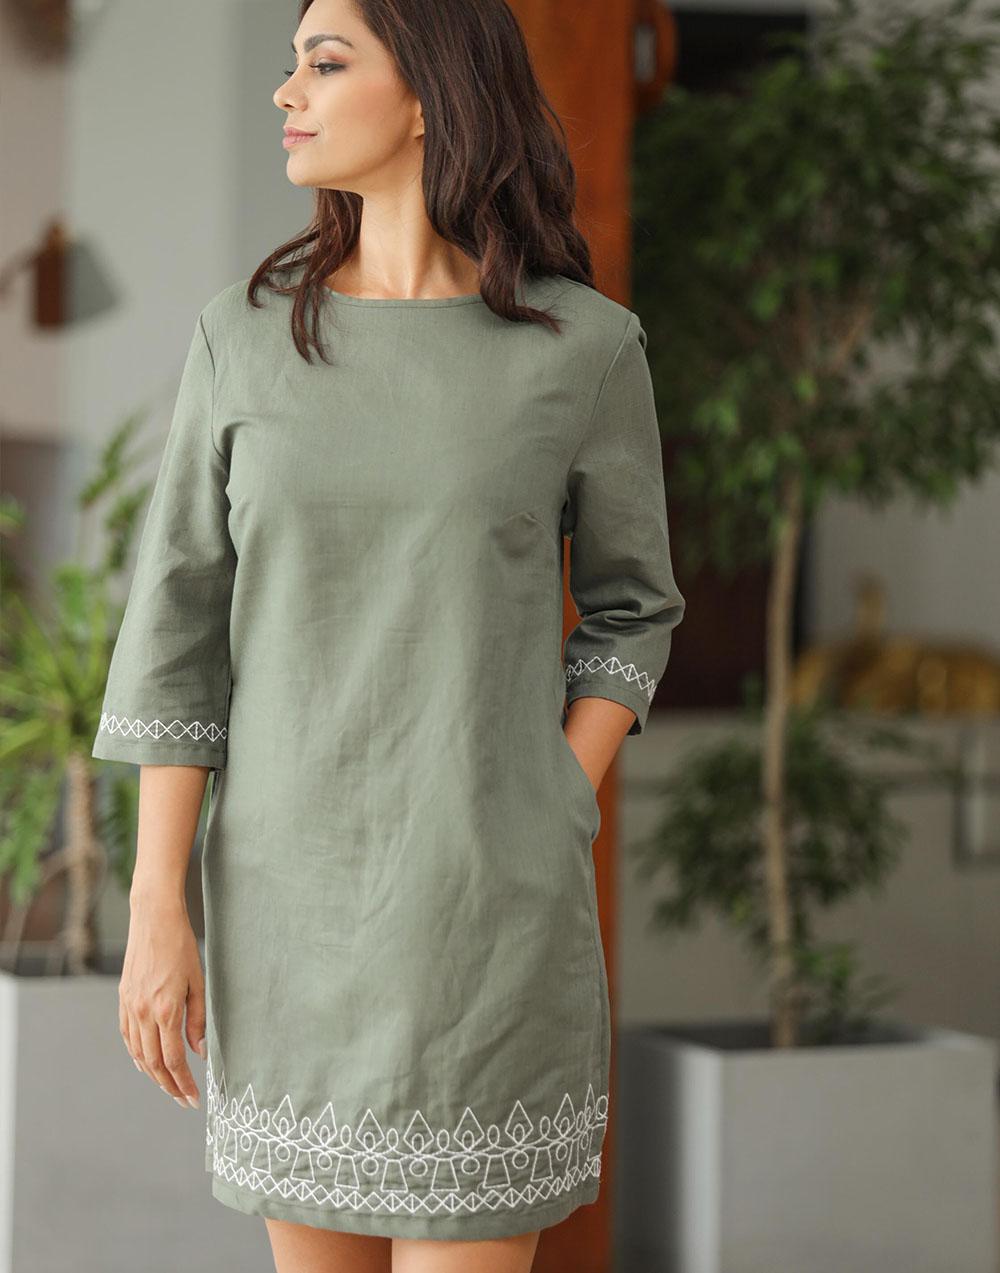 Boarder Embroidery Linen Dress